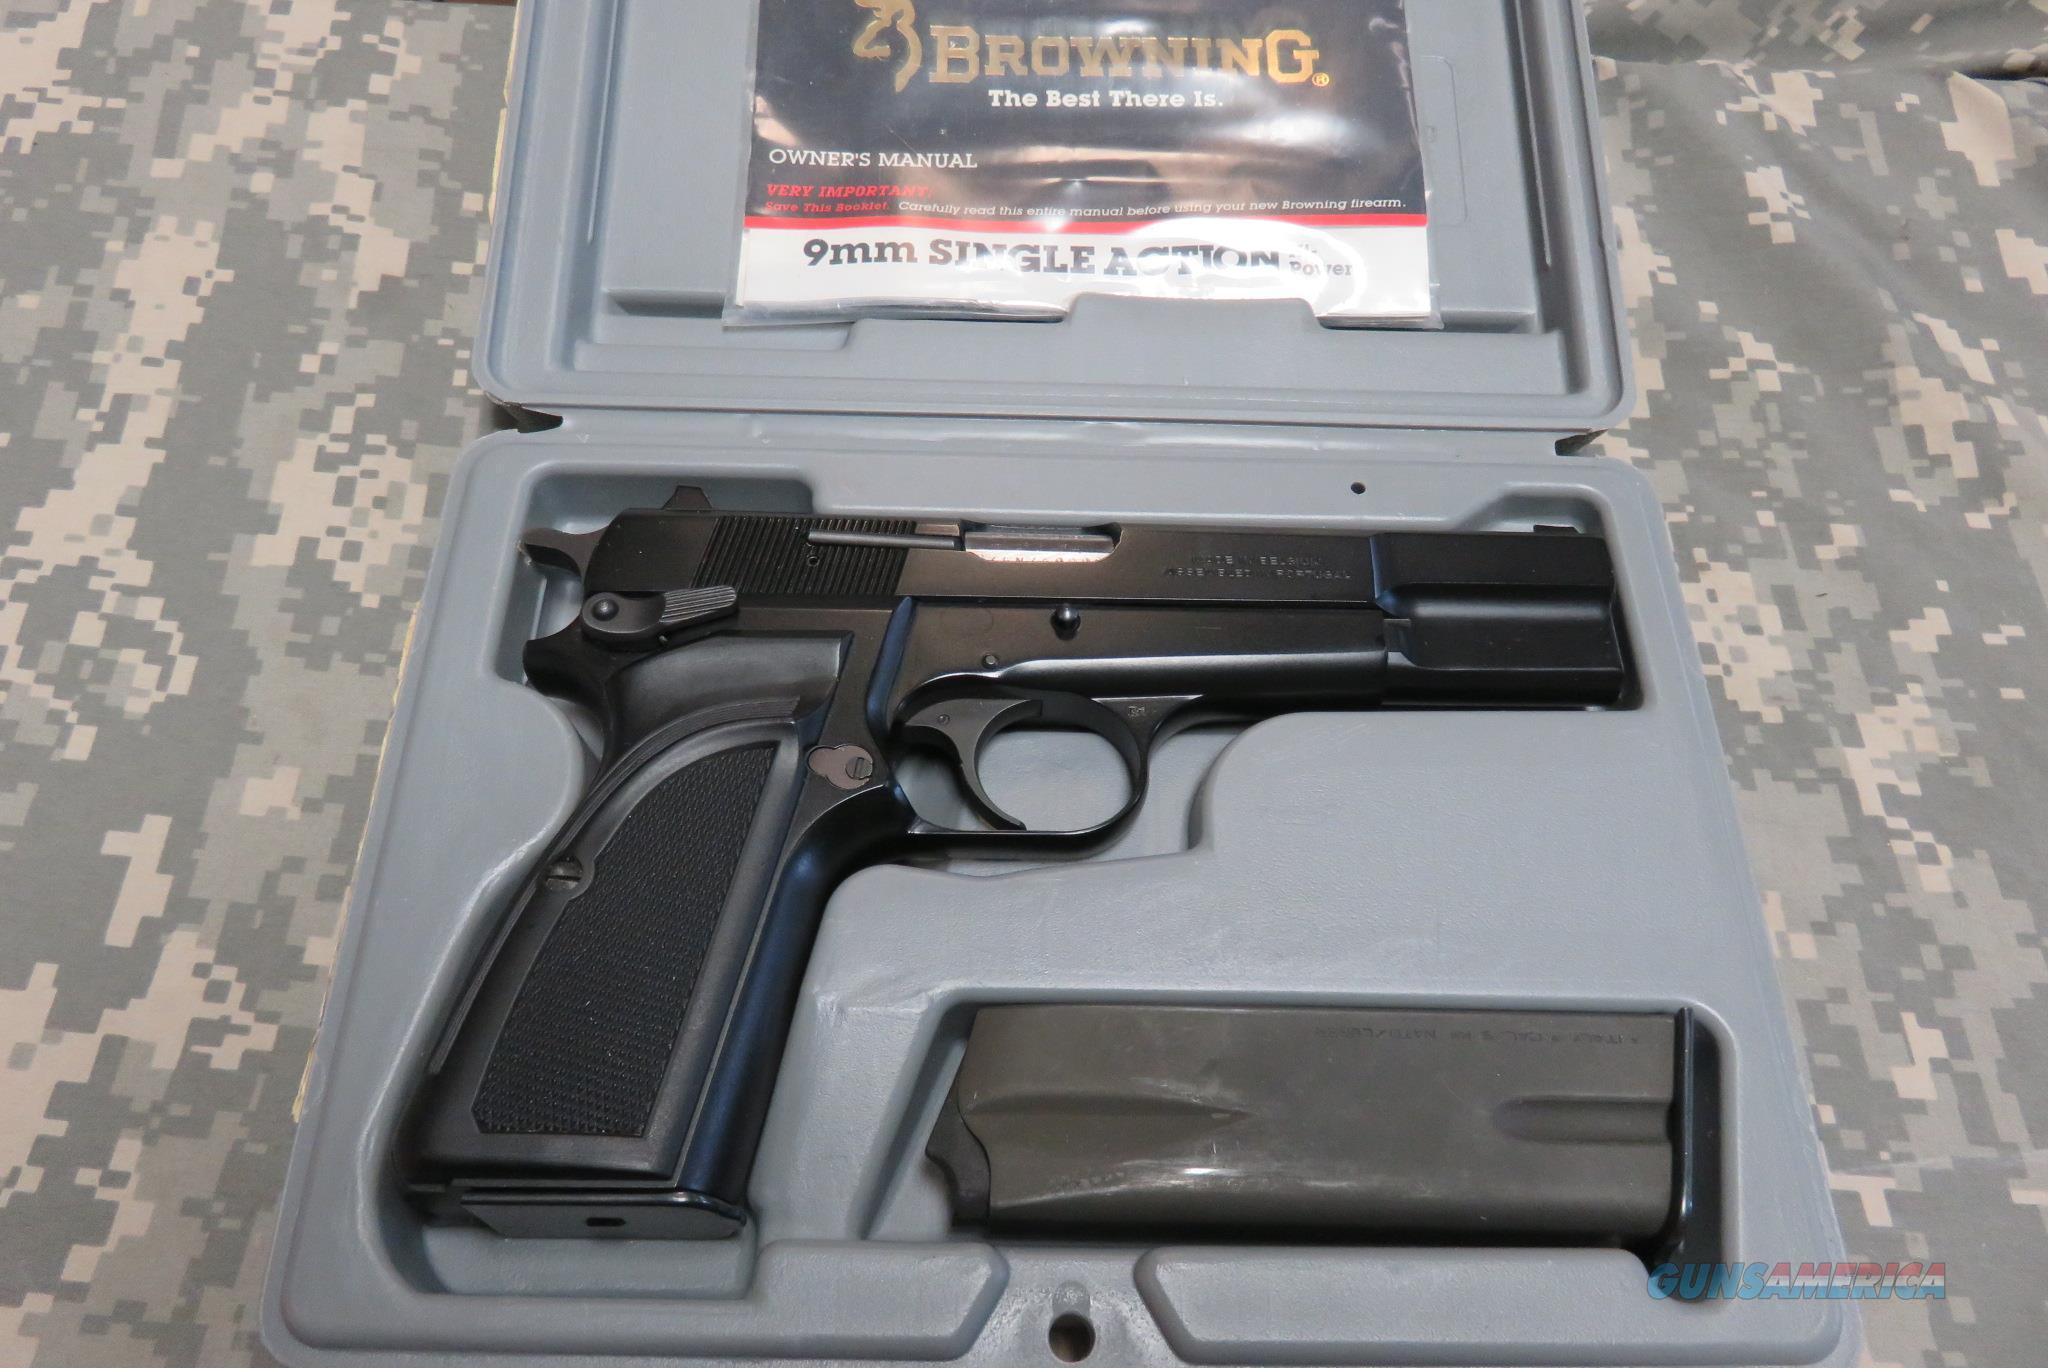 BROWNING HI POWER MARK III 9MM BLACK **LIKE NEW... for sale